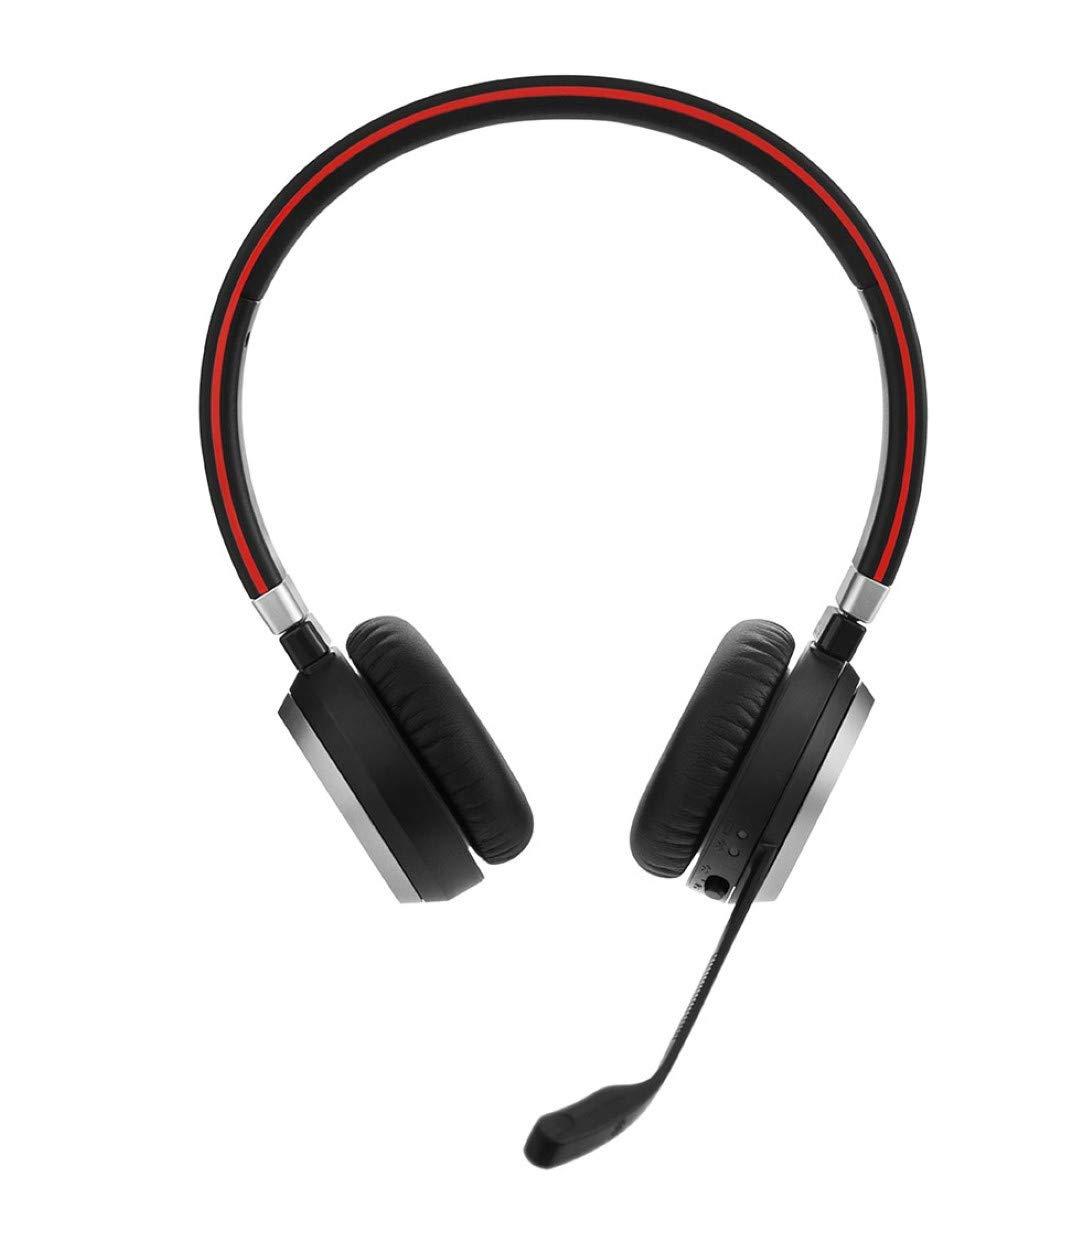 Jabra Evolve 65 Wireless Bluetooth Stereo Headset Optim 6599 829 409 129 99